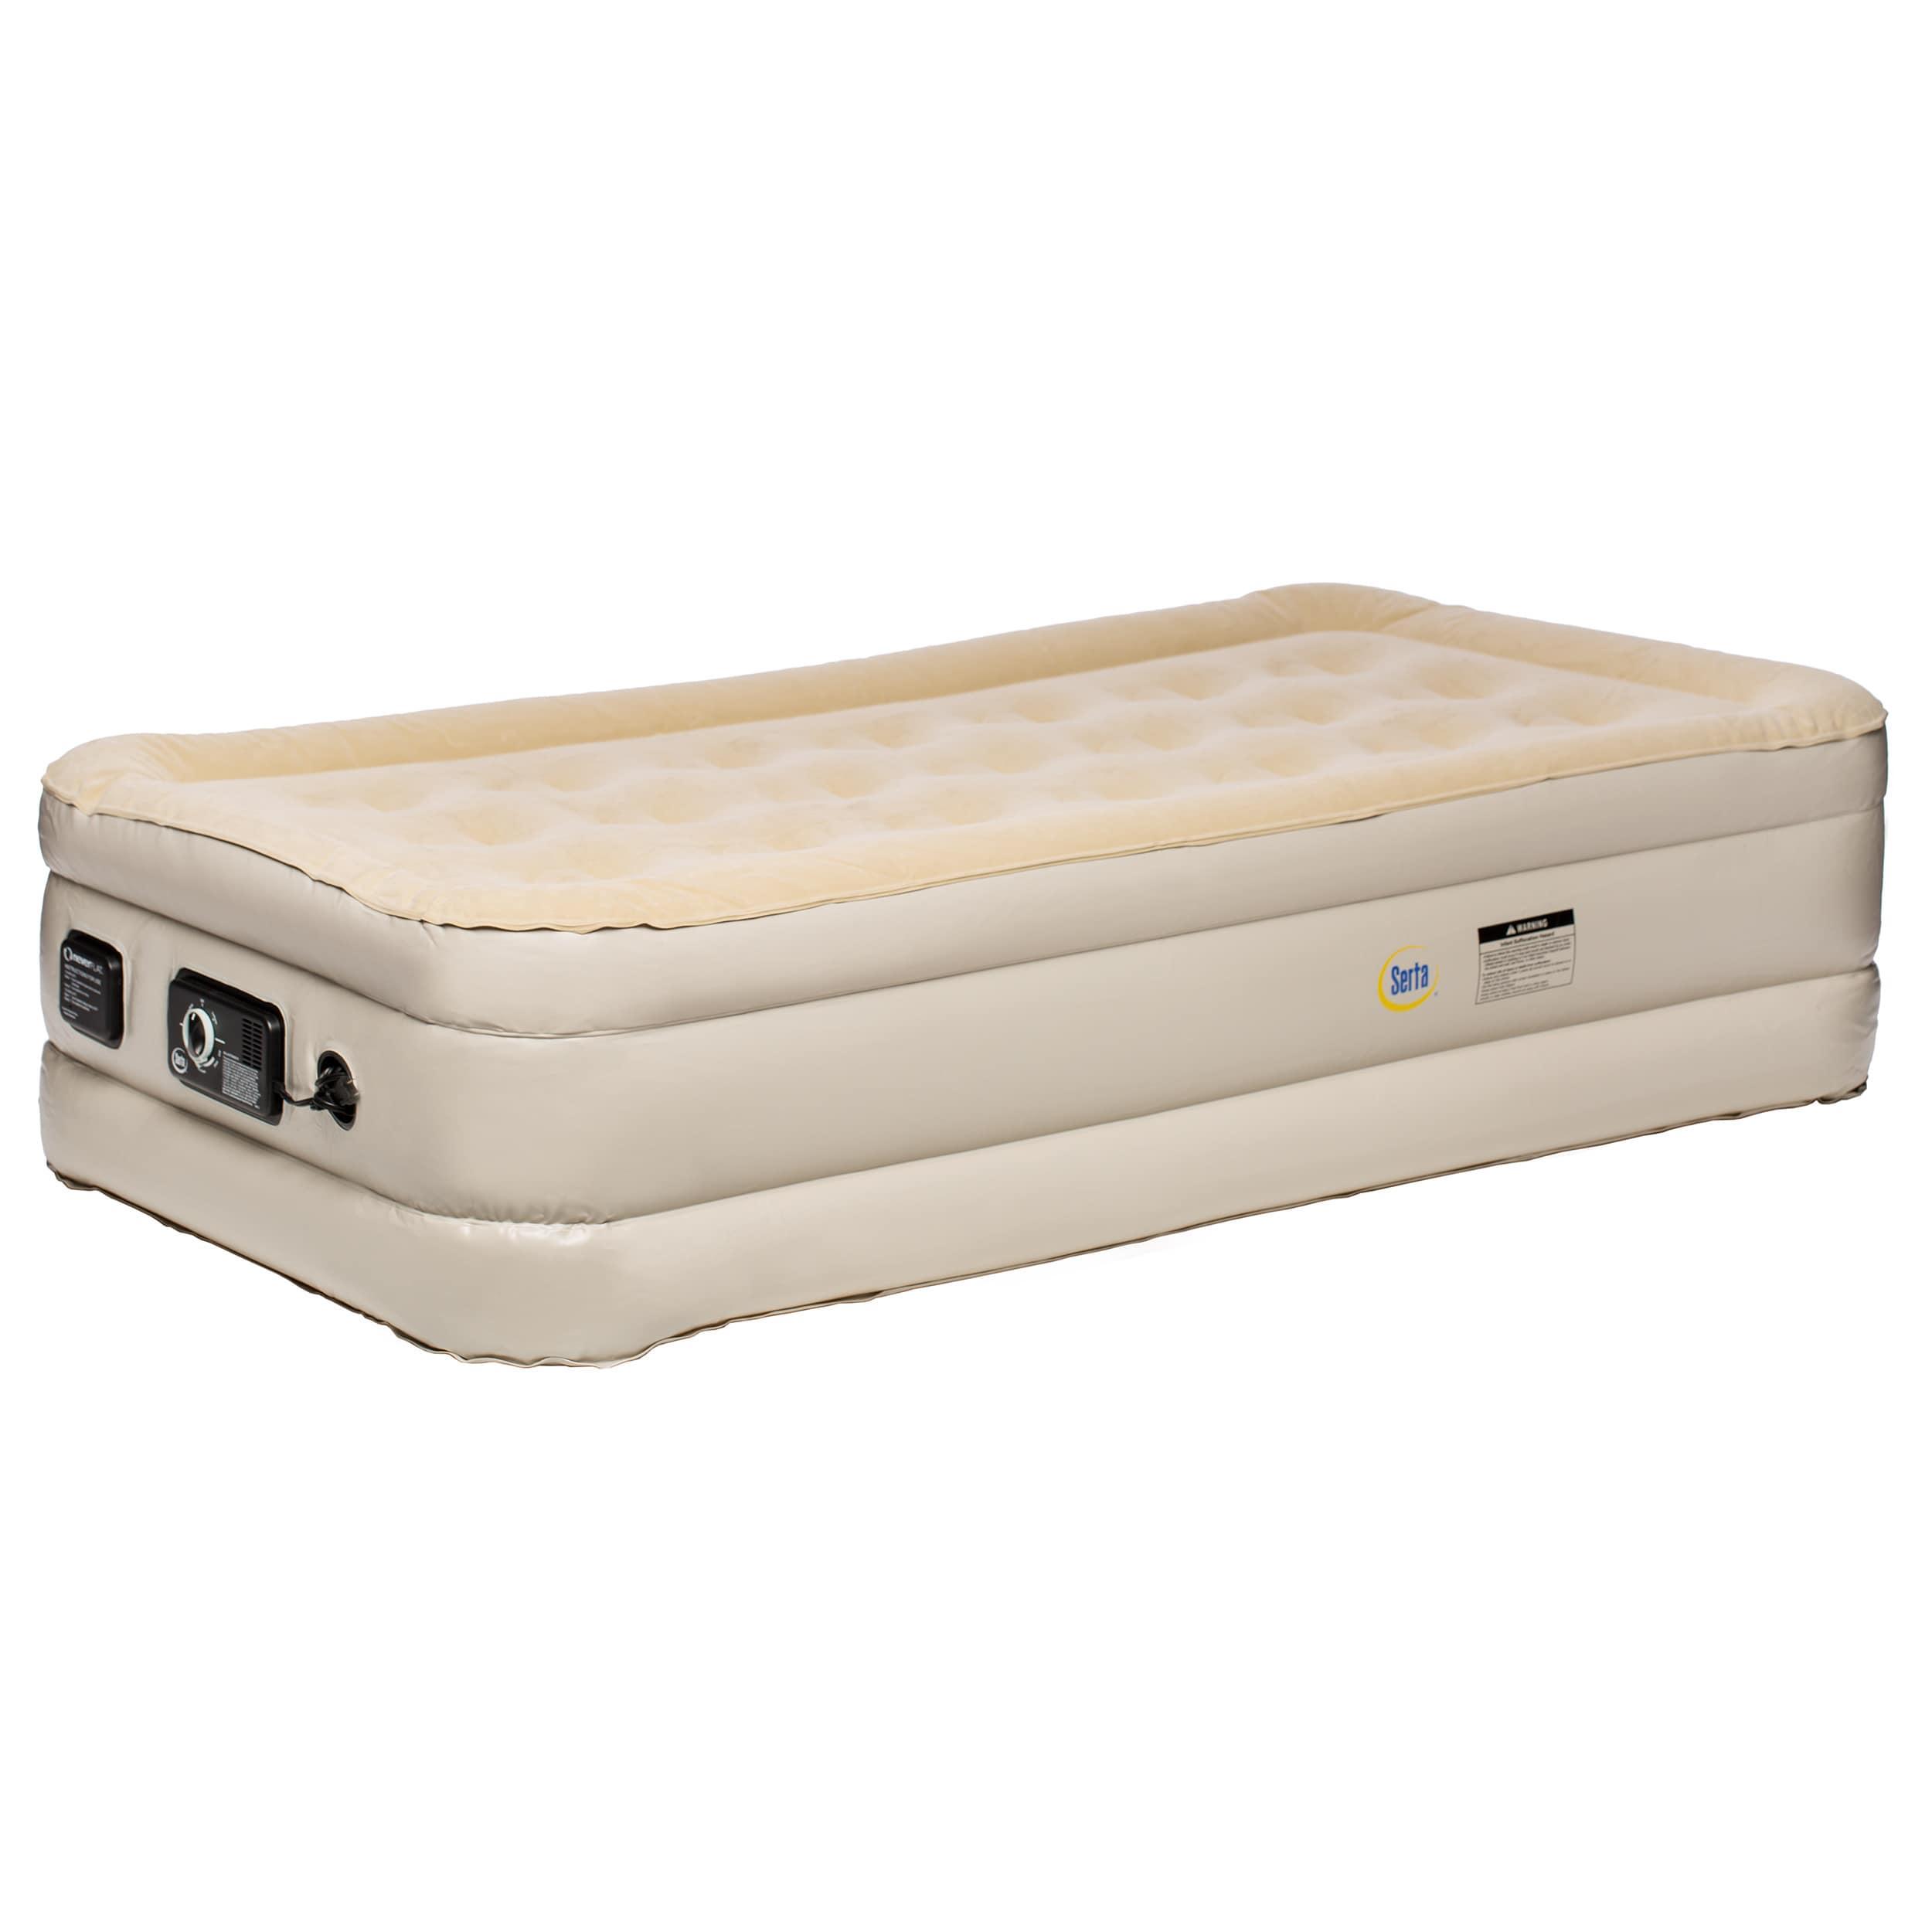 classic air for serta nirvana mattress camping outdoor intex best mattresses downy